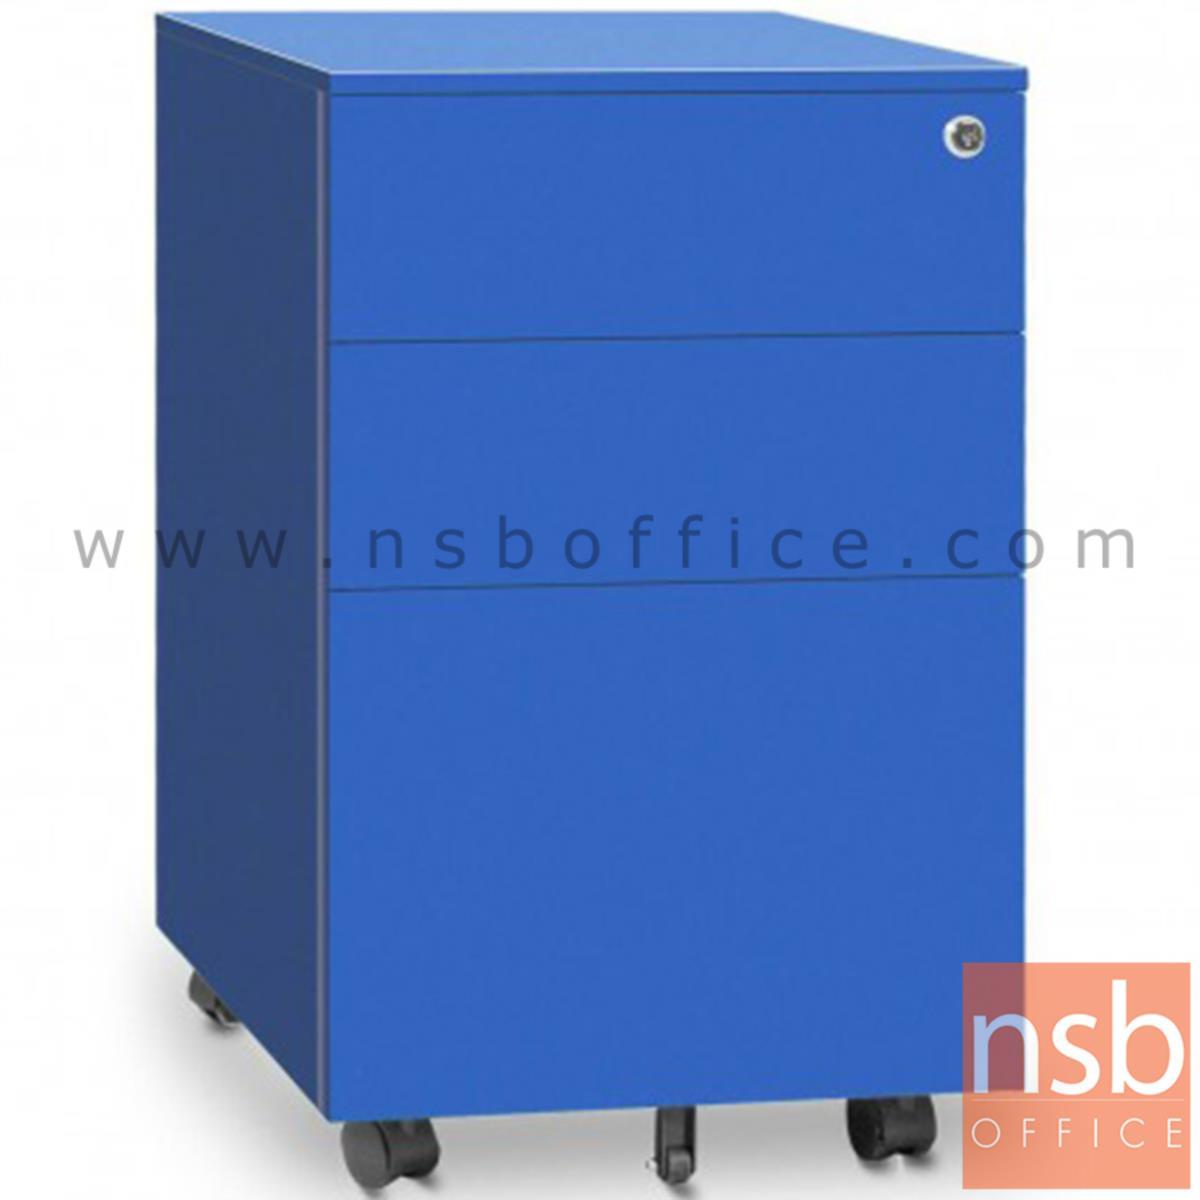 E18A019:ตู้เหล็ก 3 ลิ้นชักล้อเลื่อนสีสัน สูง 60 cm.  รุ่น PD63  มีระบบป้องกันการล้มในตัว